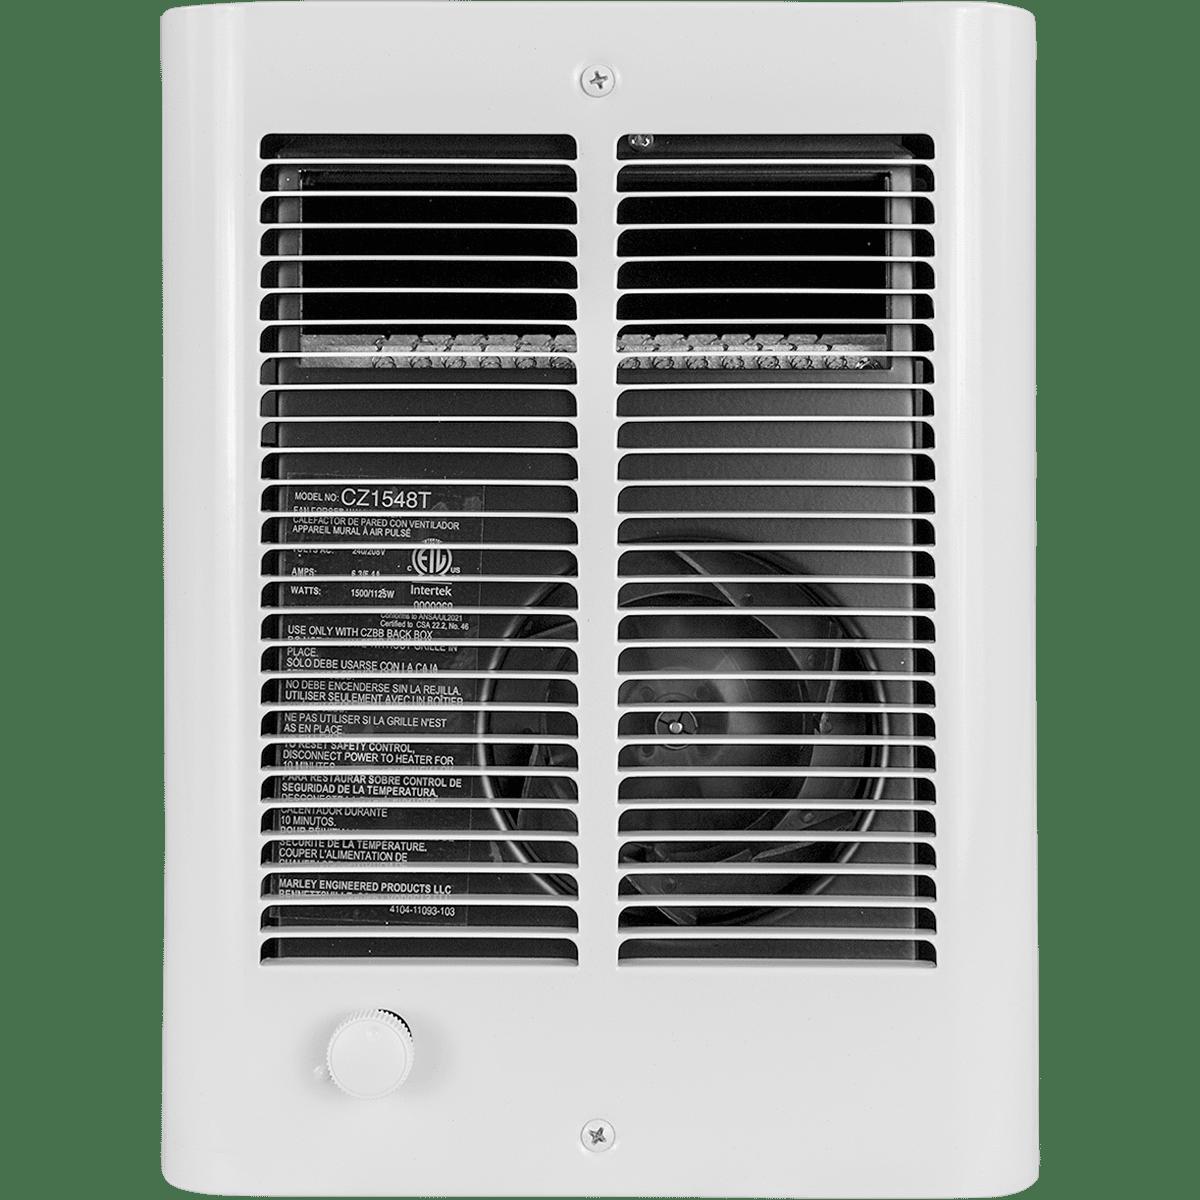 QMark COS-E Fan-Forced Wall Heaters | SylvaneSylvane